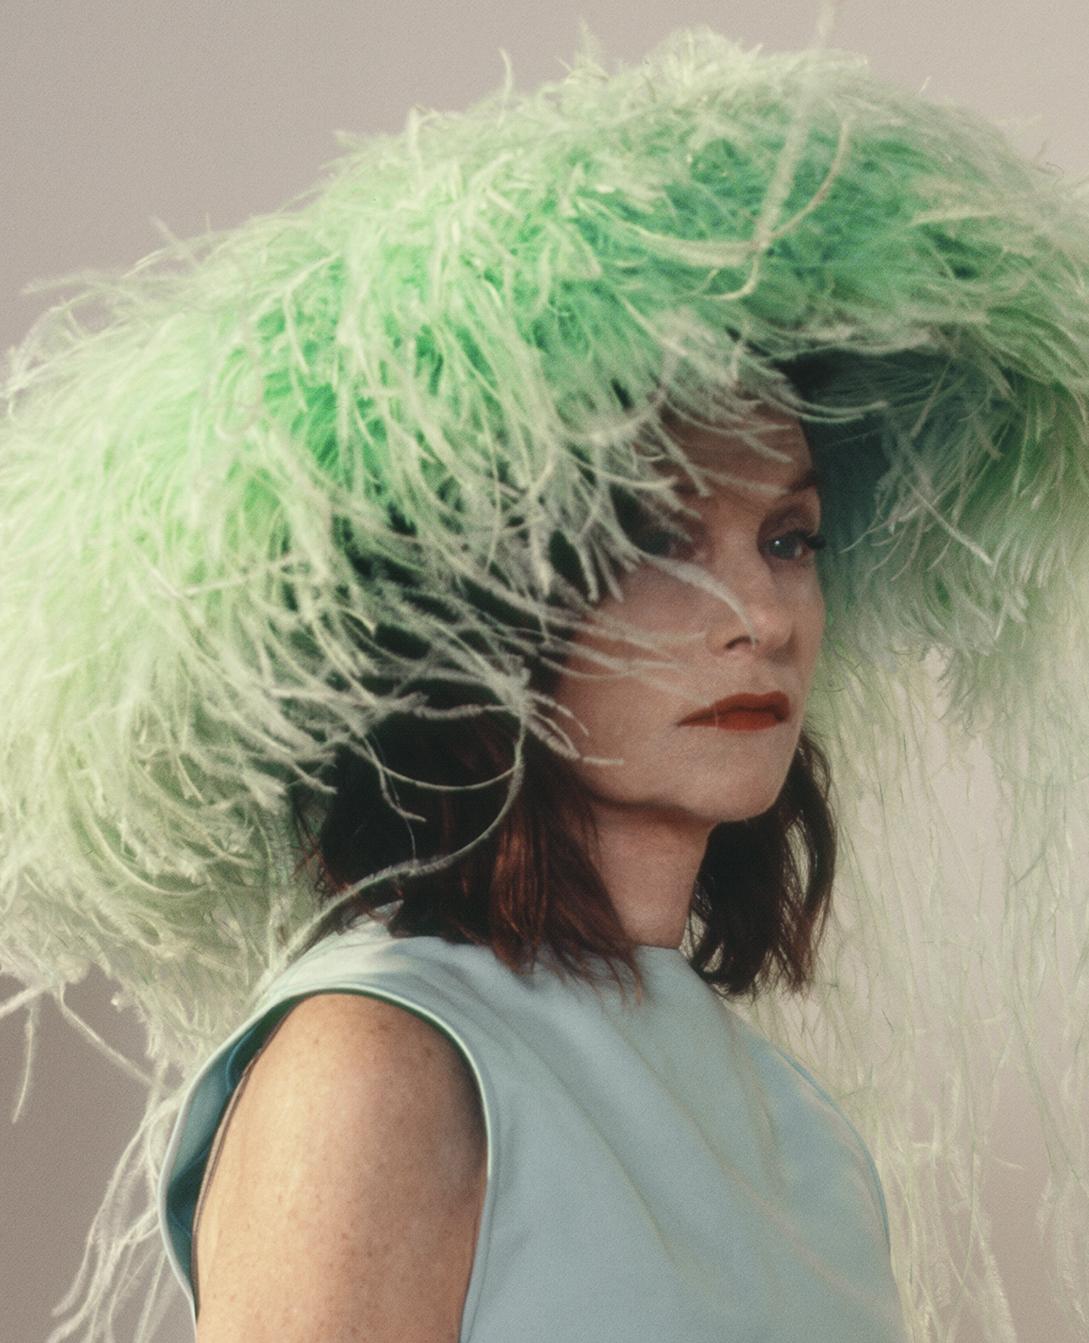 Isabelle Huppert Valentino Haute Couture for Crash Magazine